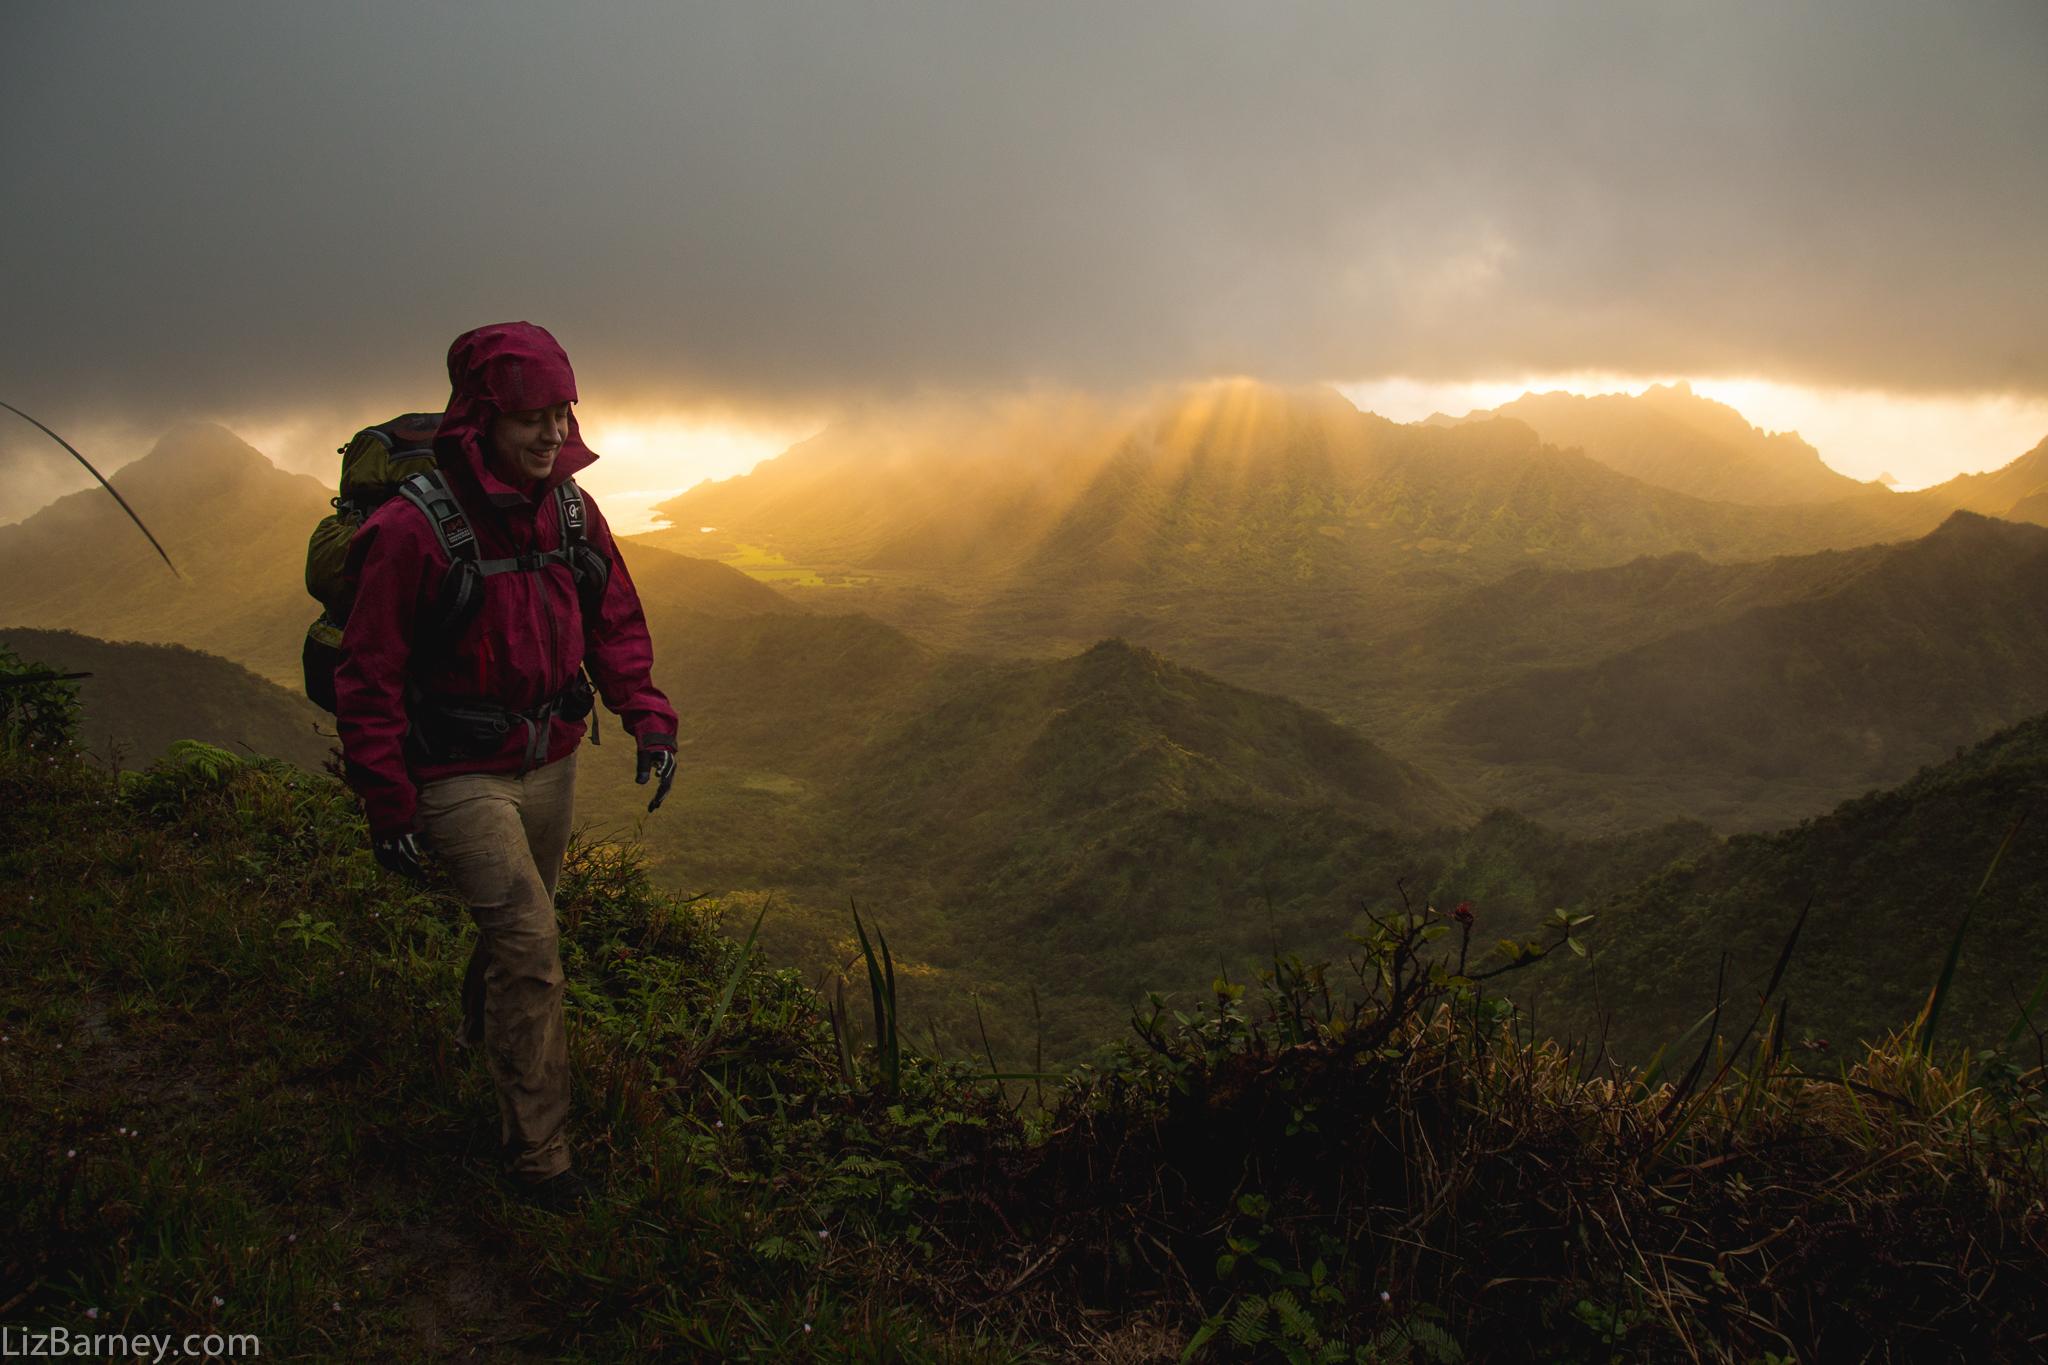 Expedition across O'ahu Island, Hawaii